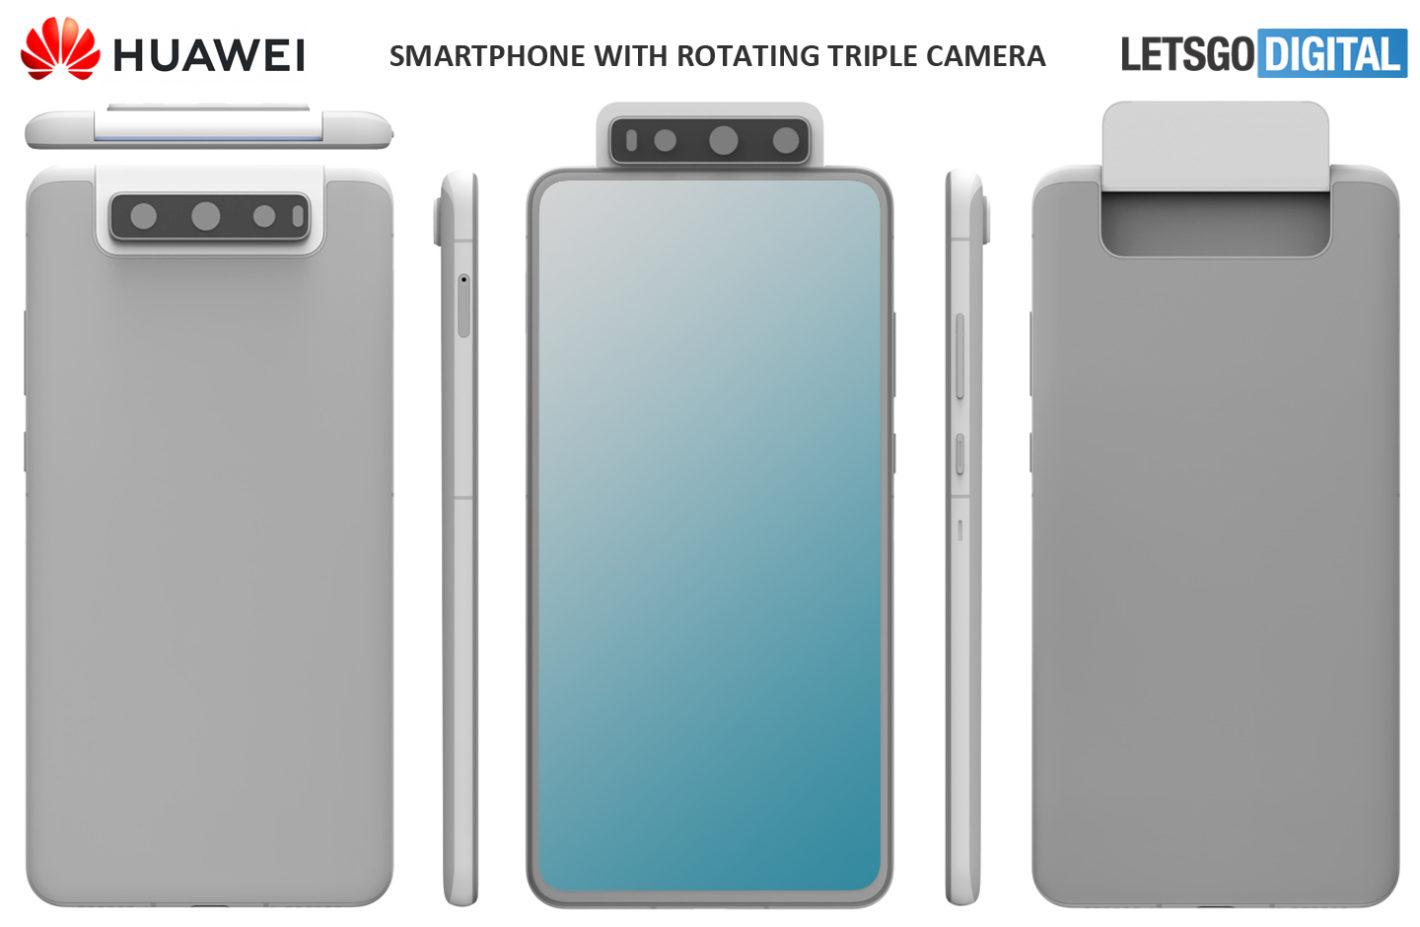 Huawei triple camera